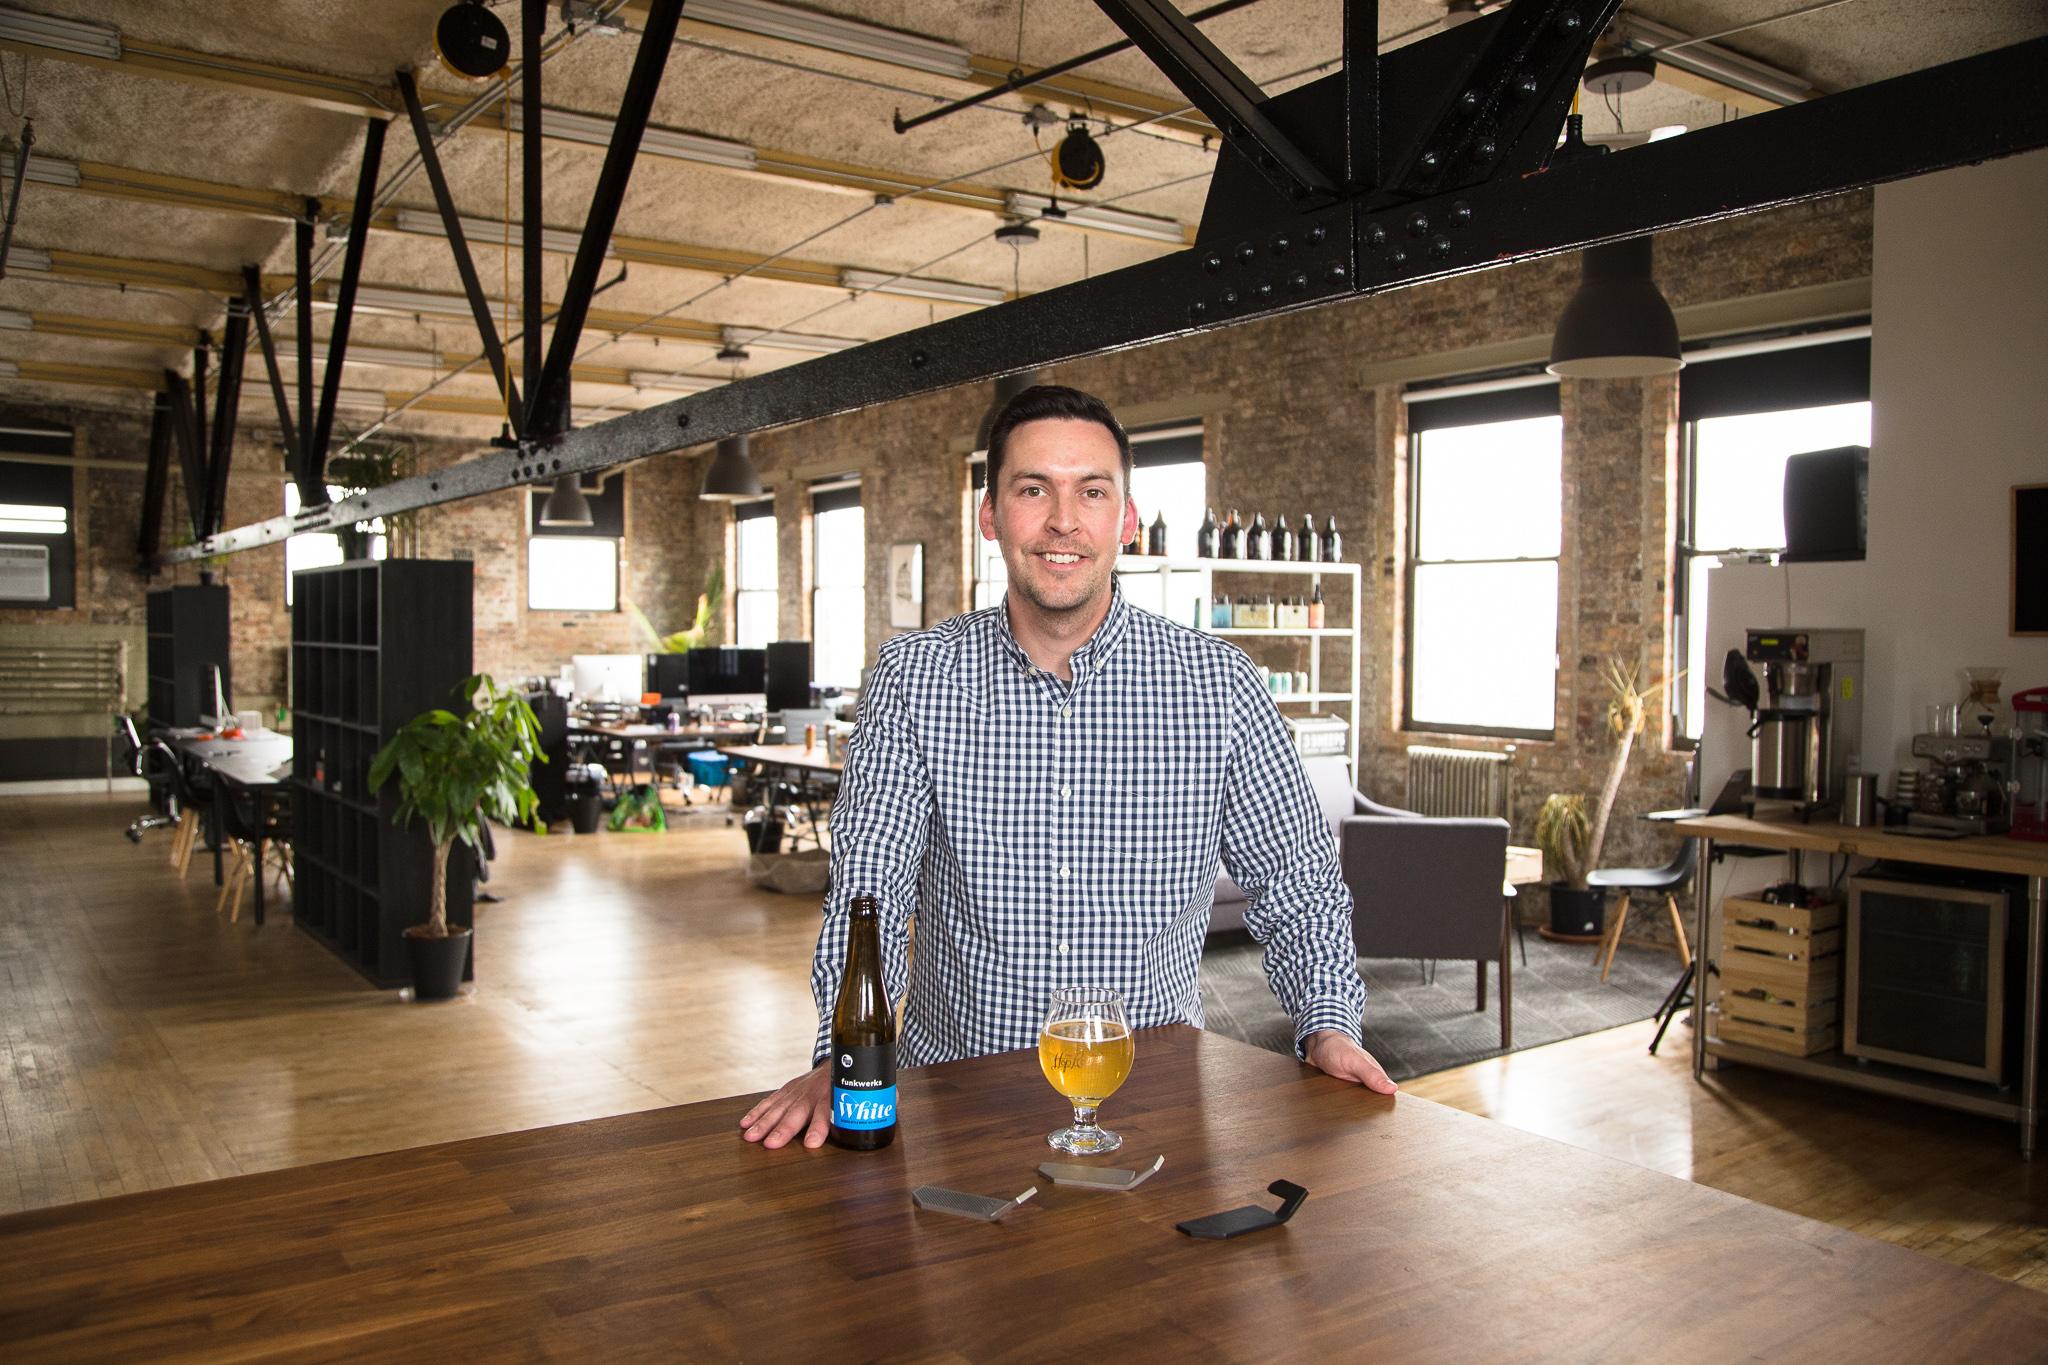 Studio Malt x MTRL DSGN - Design Meets Beverages